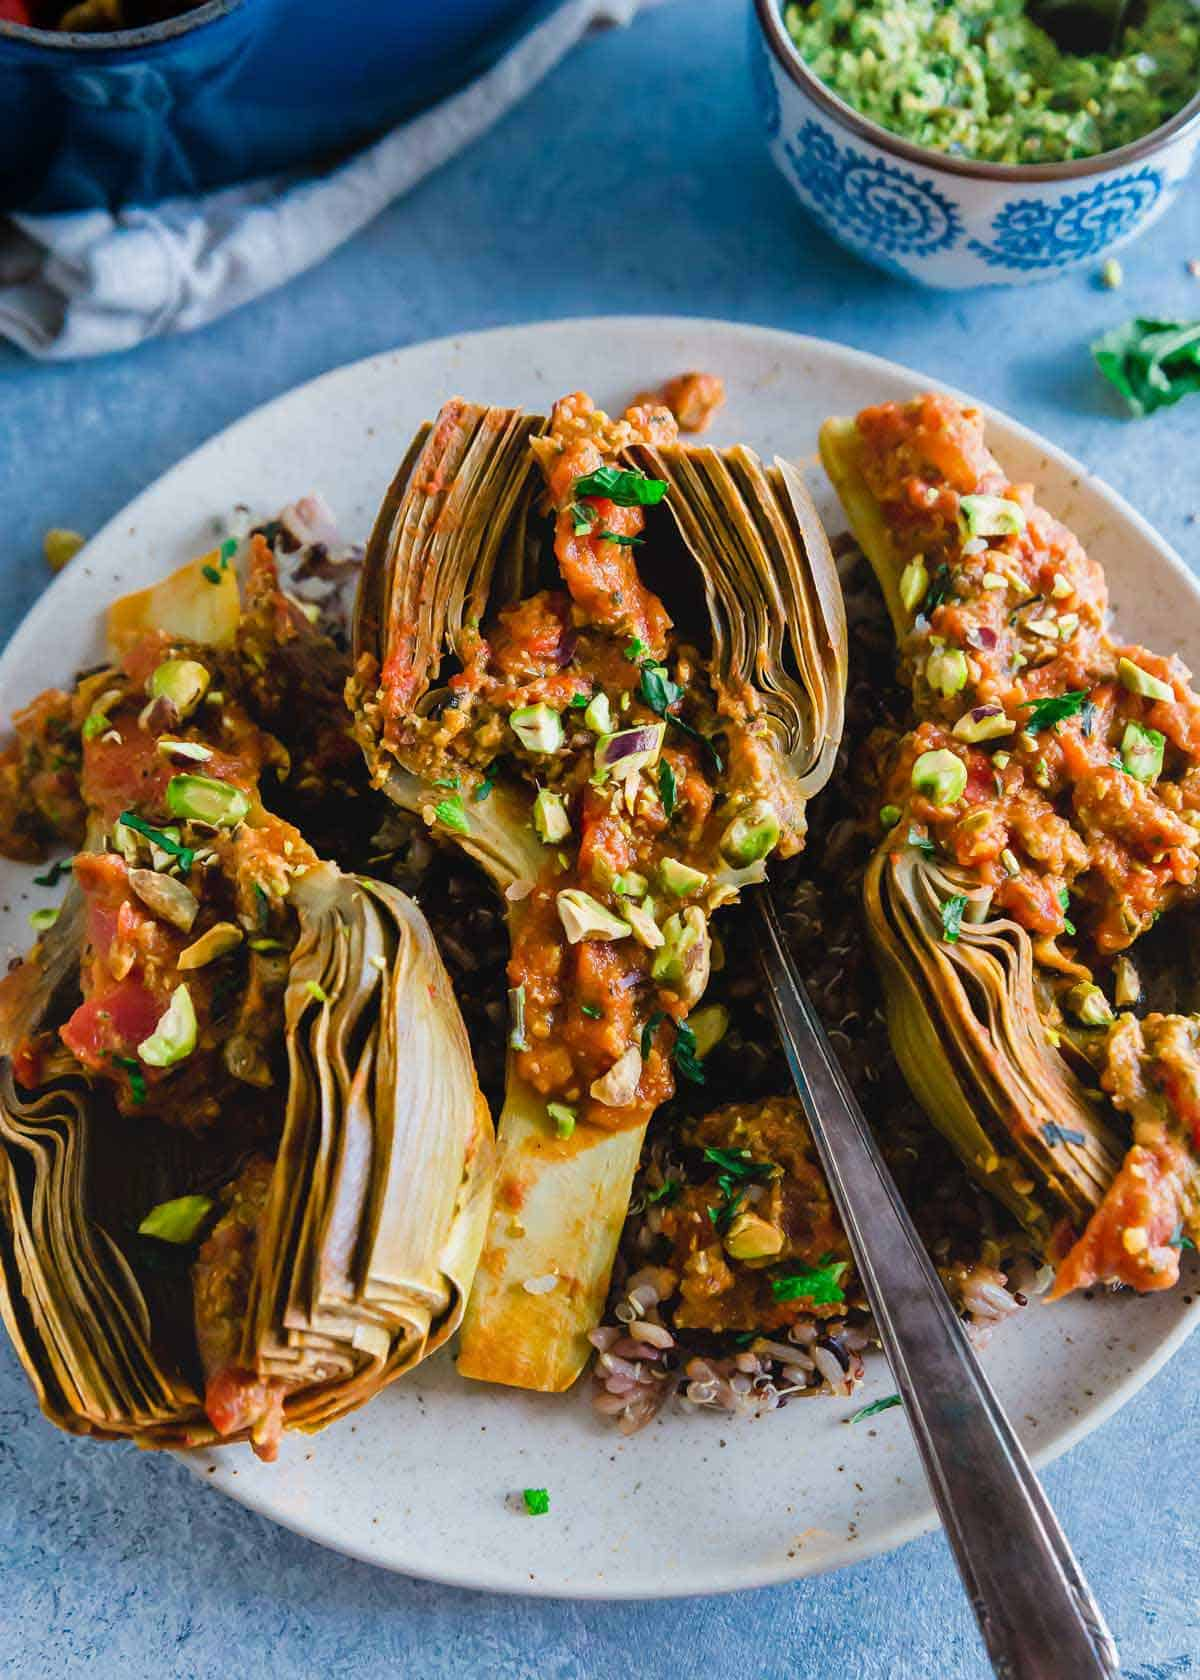 tomato braised artichokes with pistachio pesto